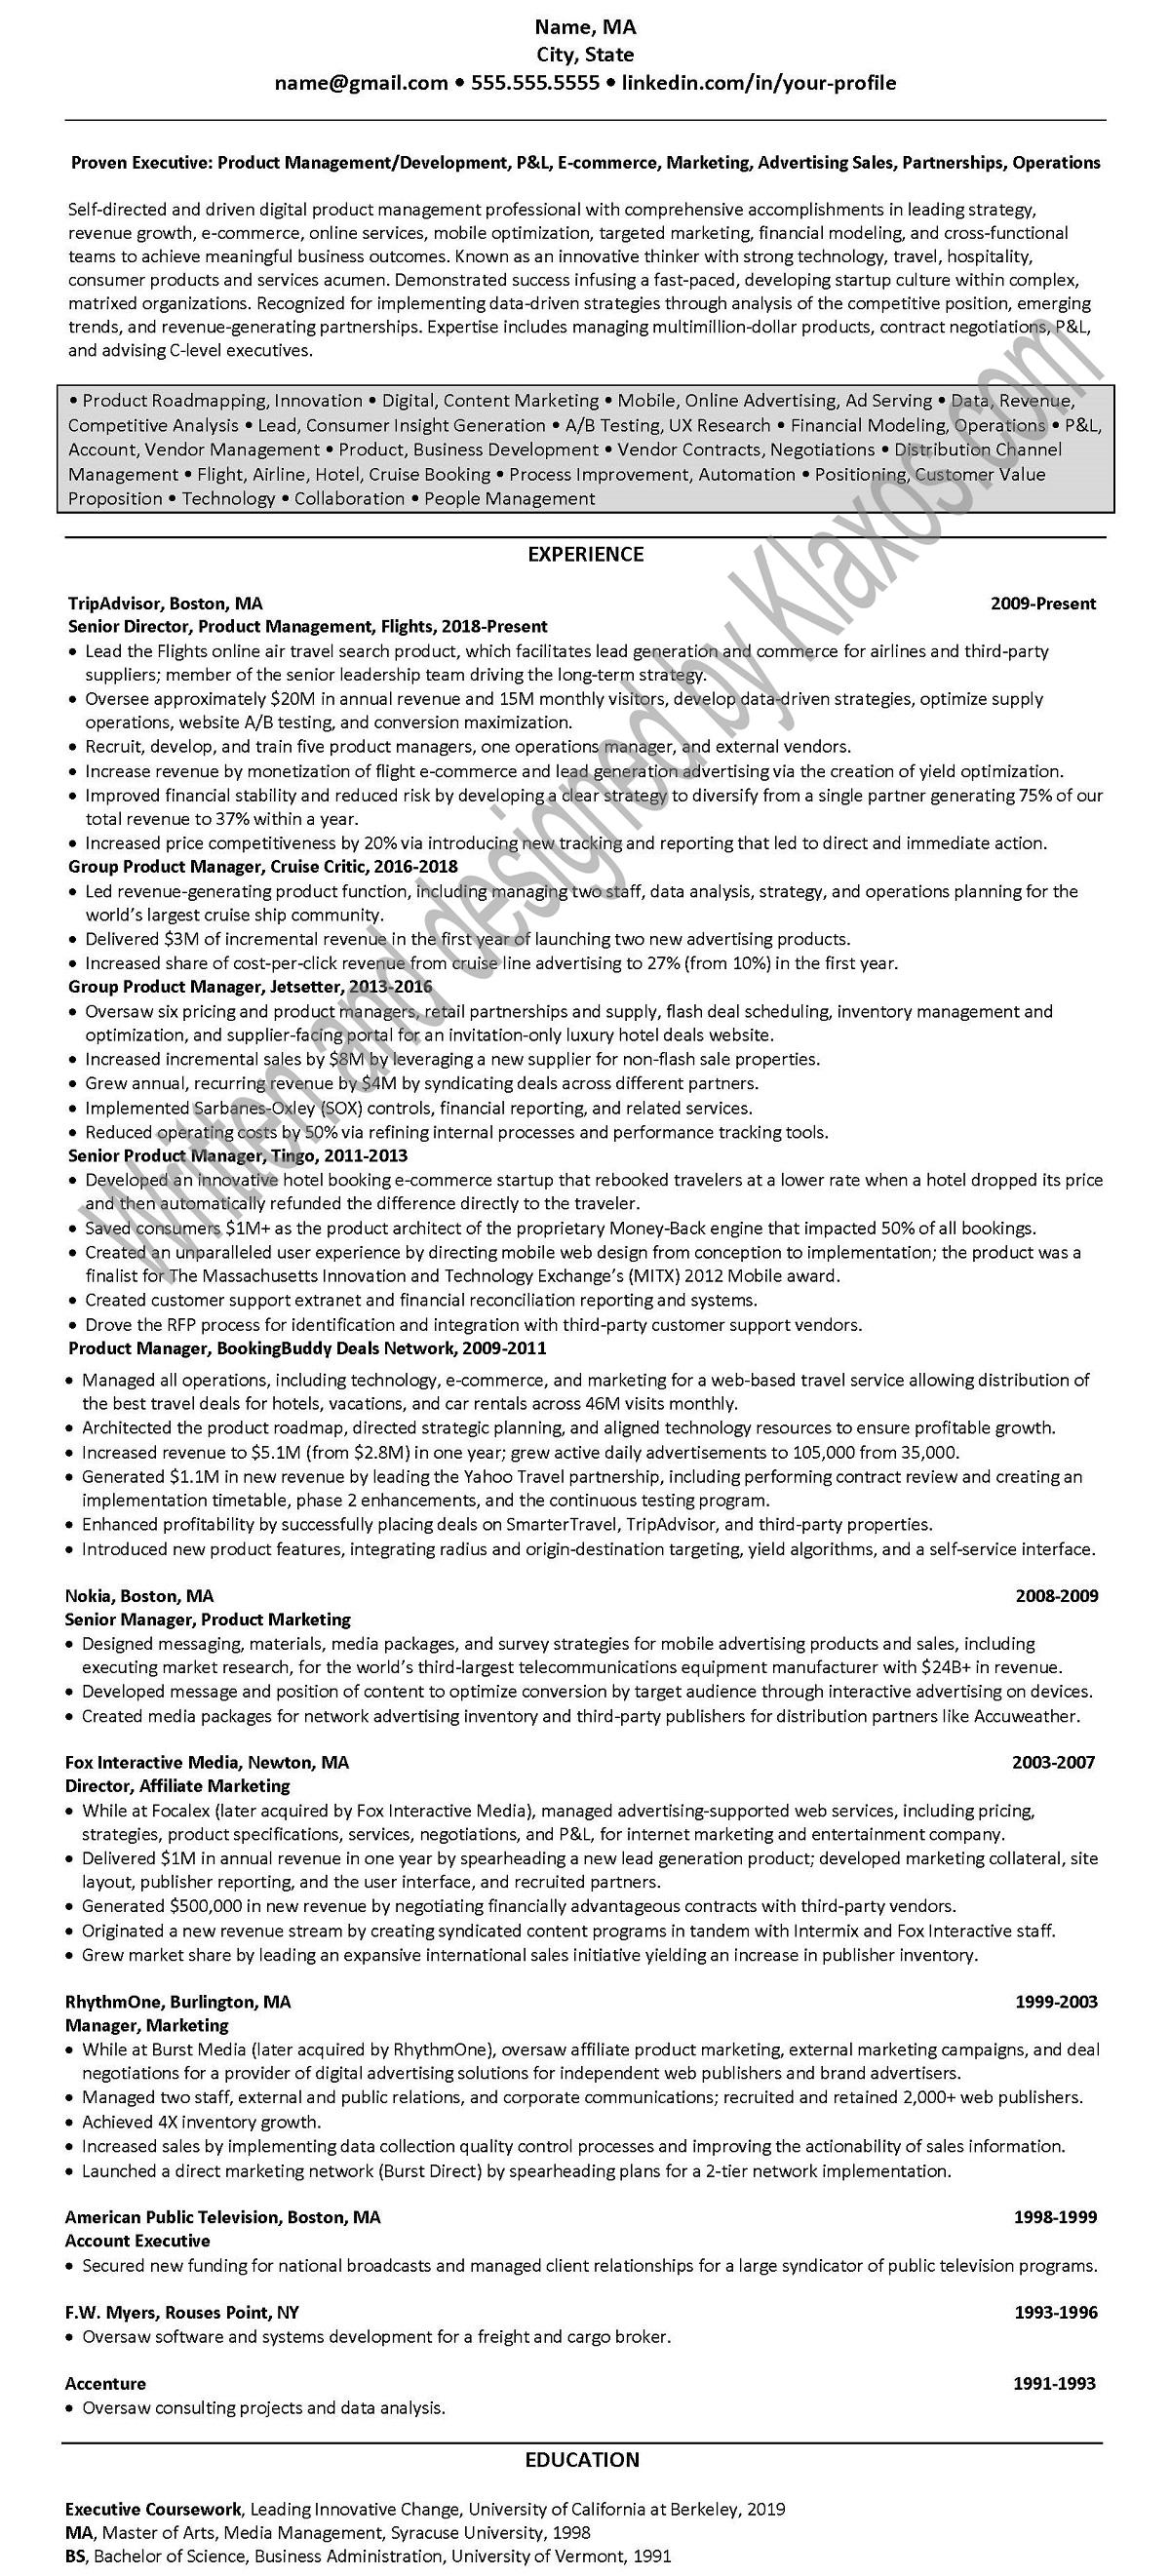 Resume 2932